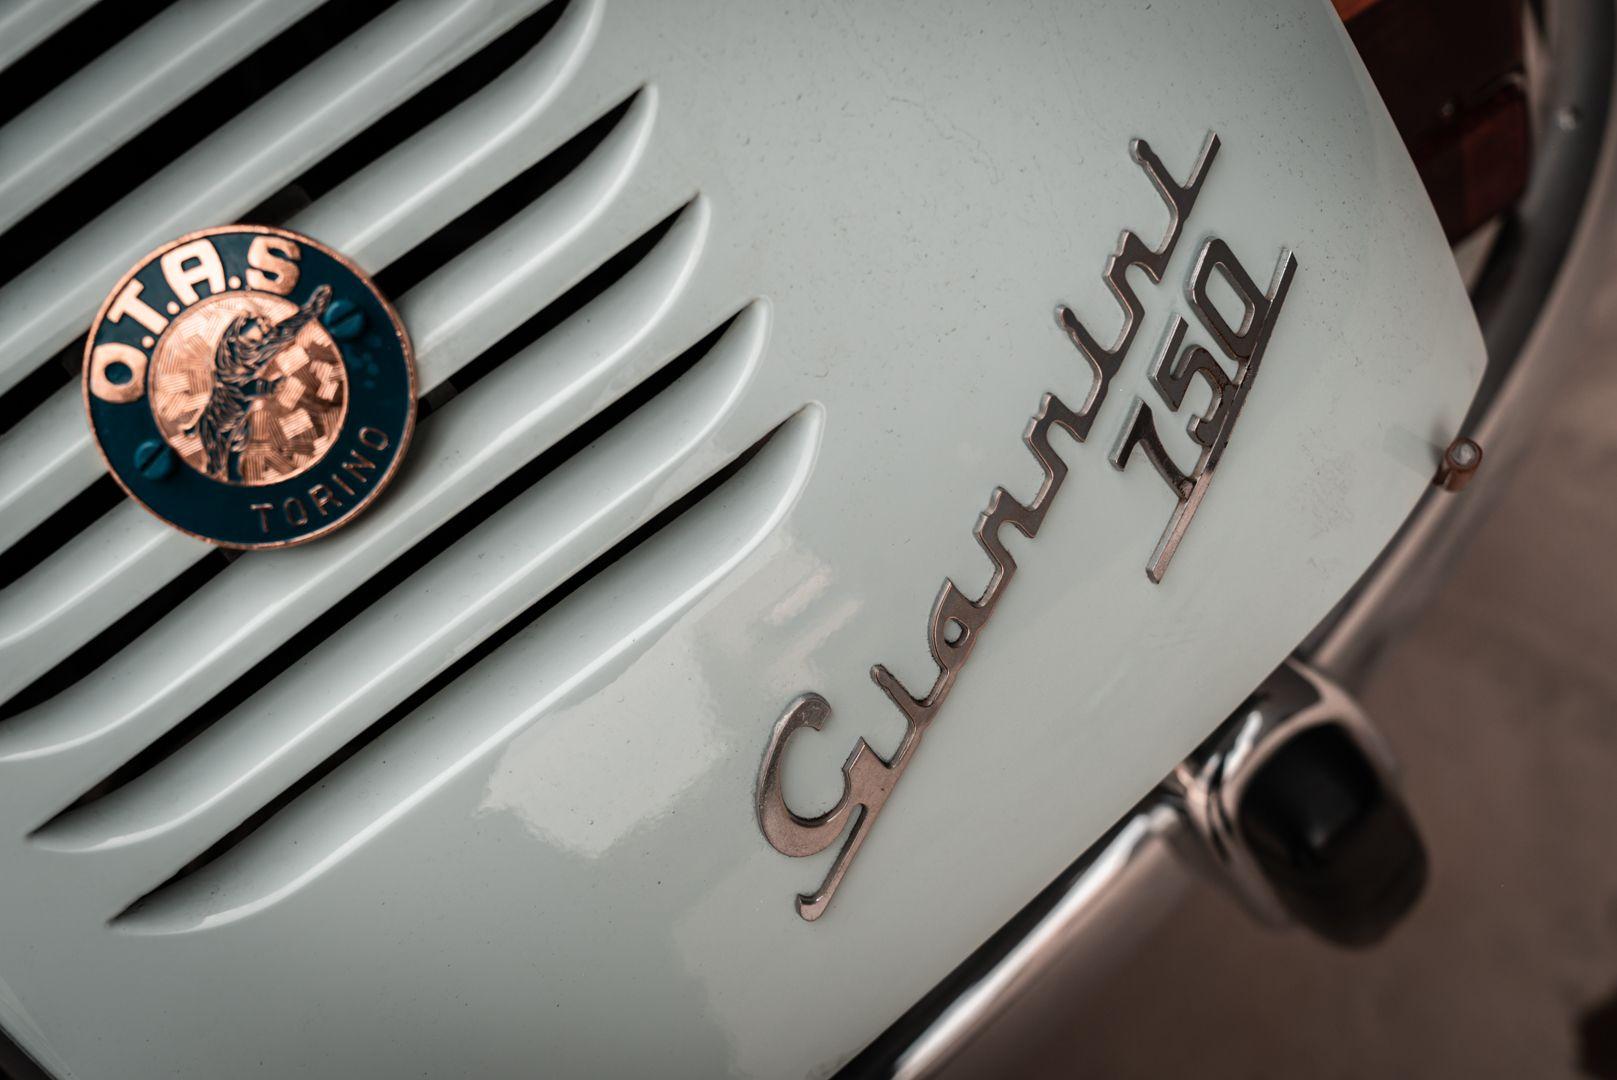 1968 Fiat Giannini 750 TV Turismo Veloce 77101